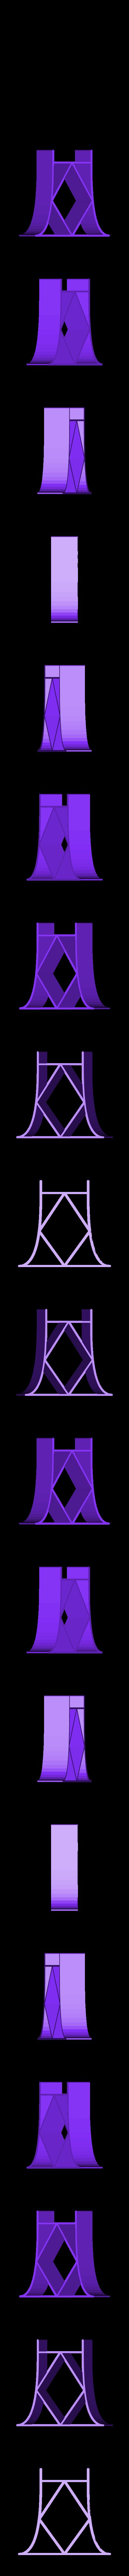 Bridge.stl Download free STL file Wooden railway bridge support • 3D print object, arpruss